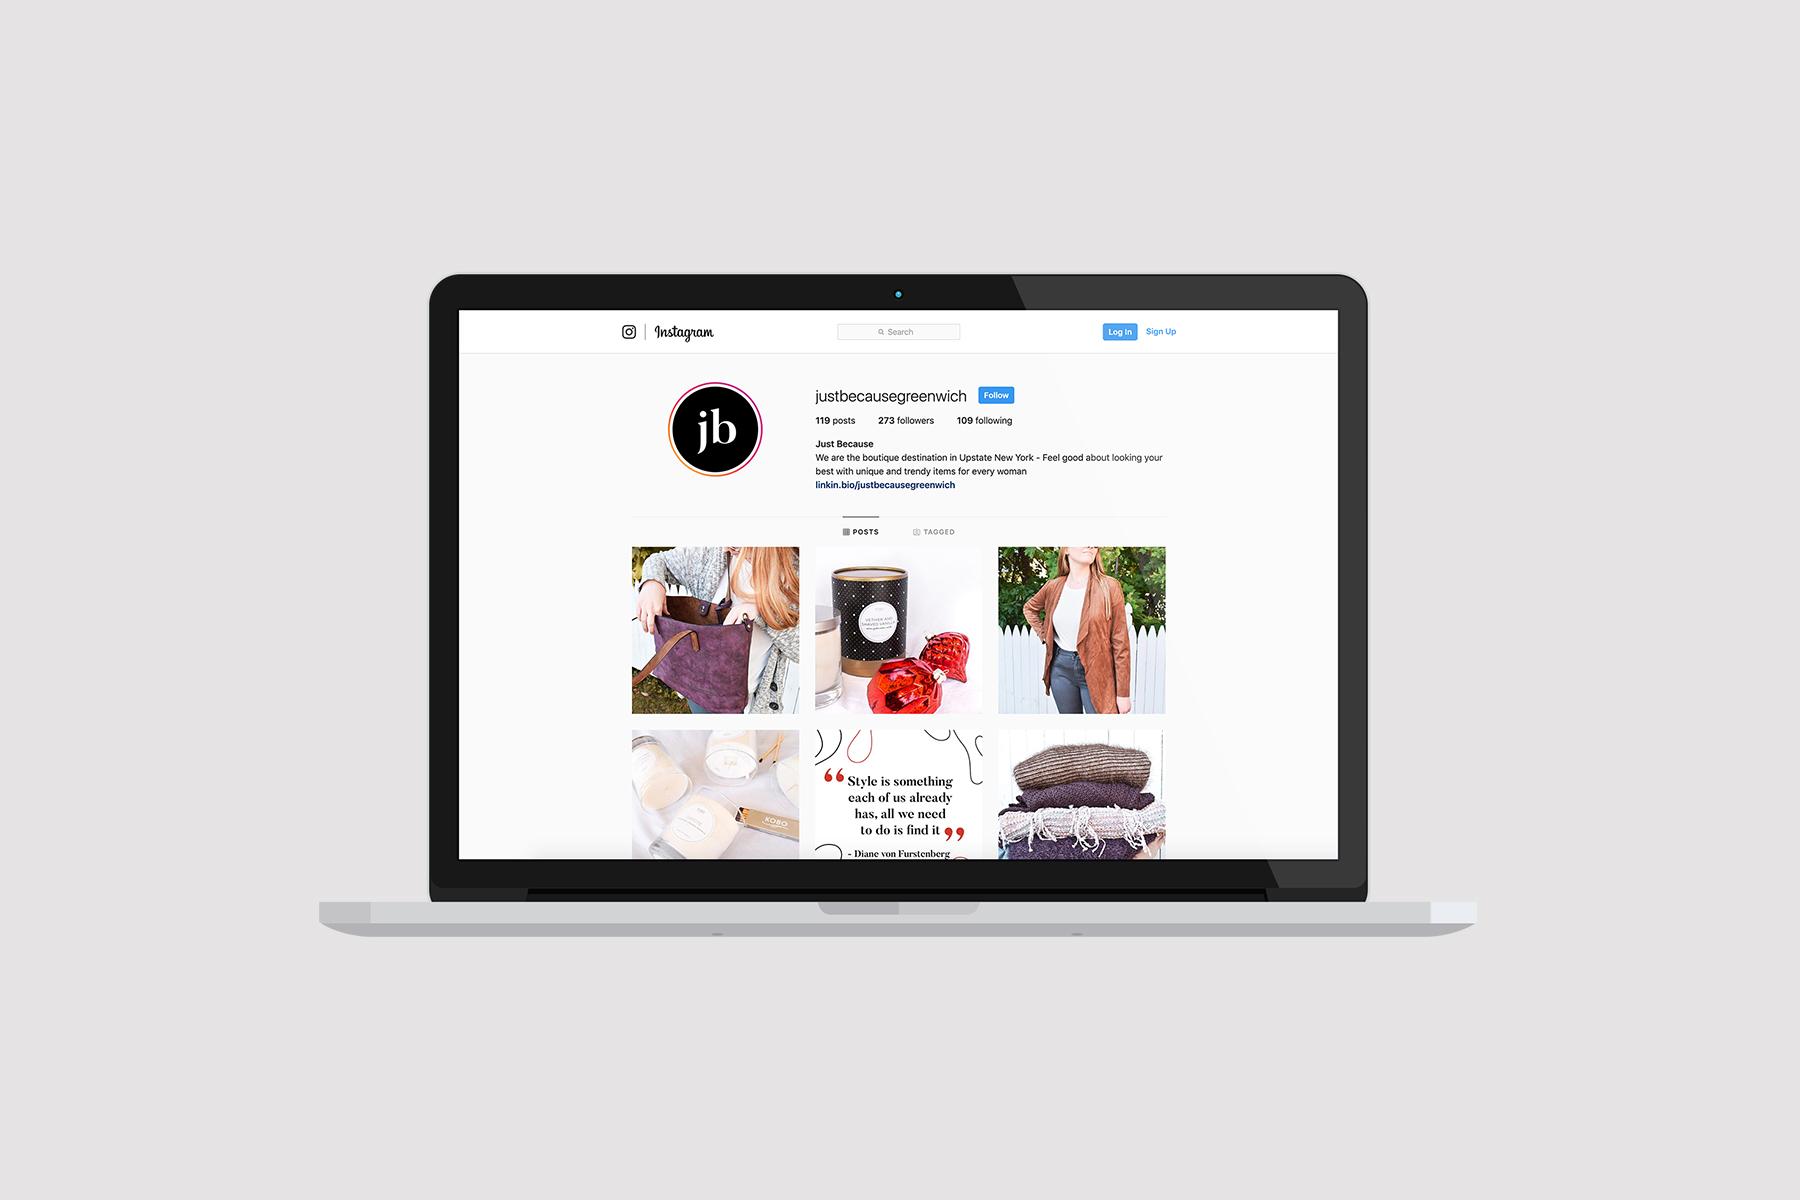 MacBook with social media Instagram profile